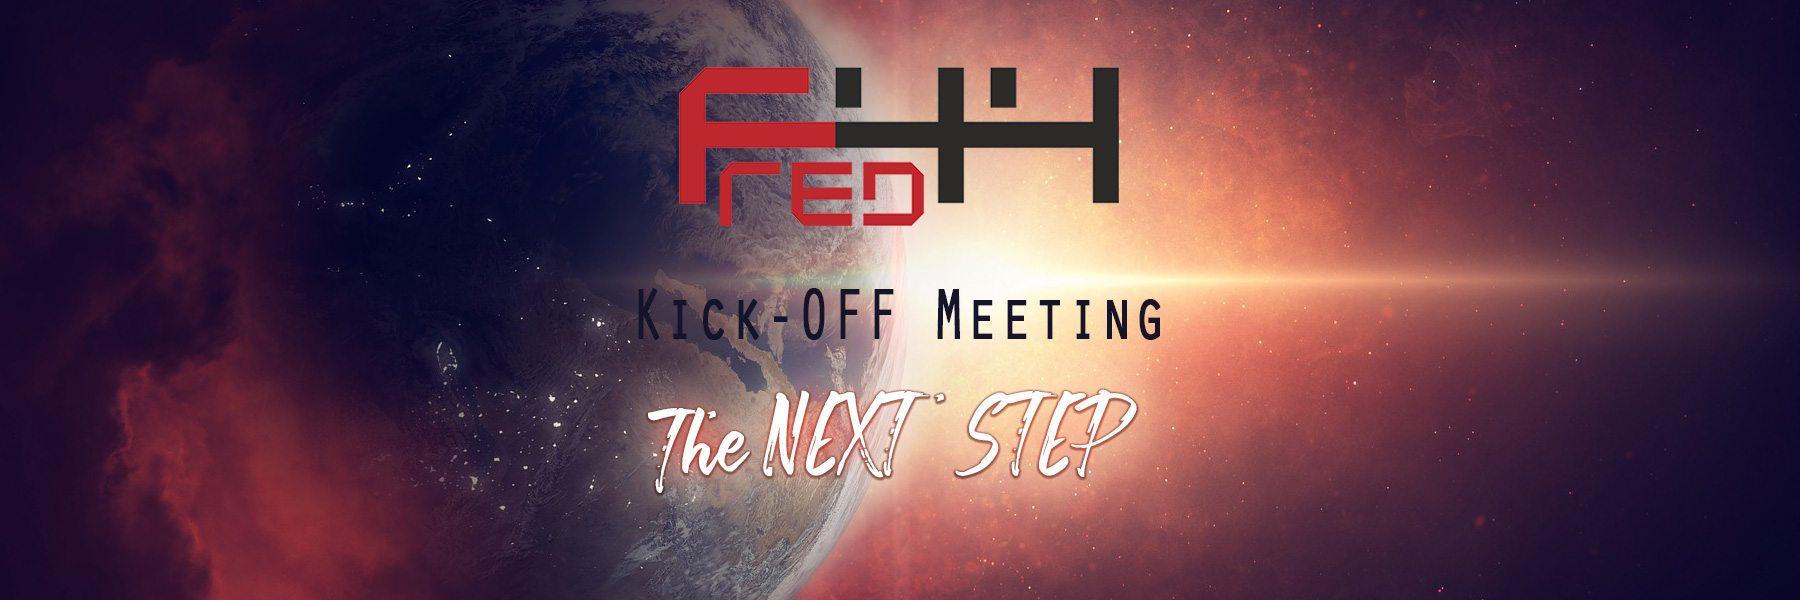 kcikoffmeeting-nextstep-SITE